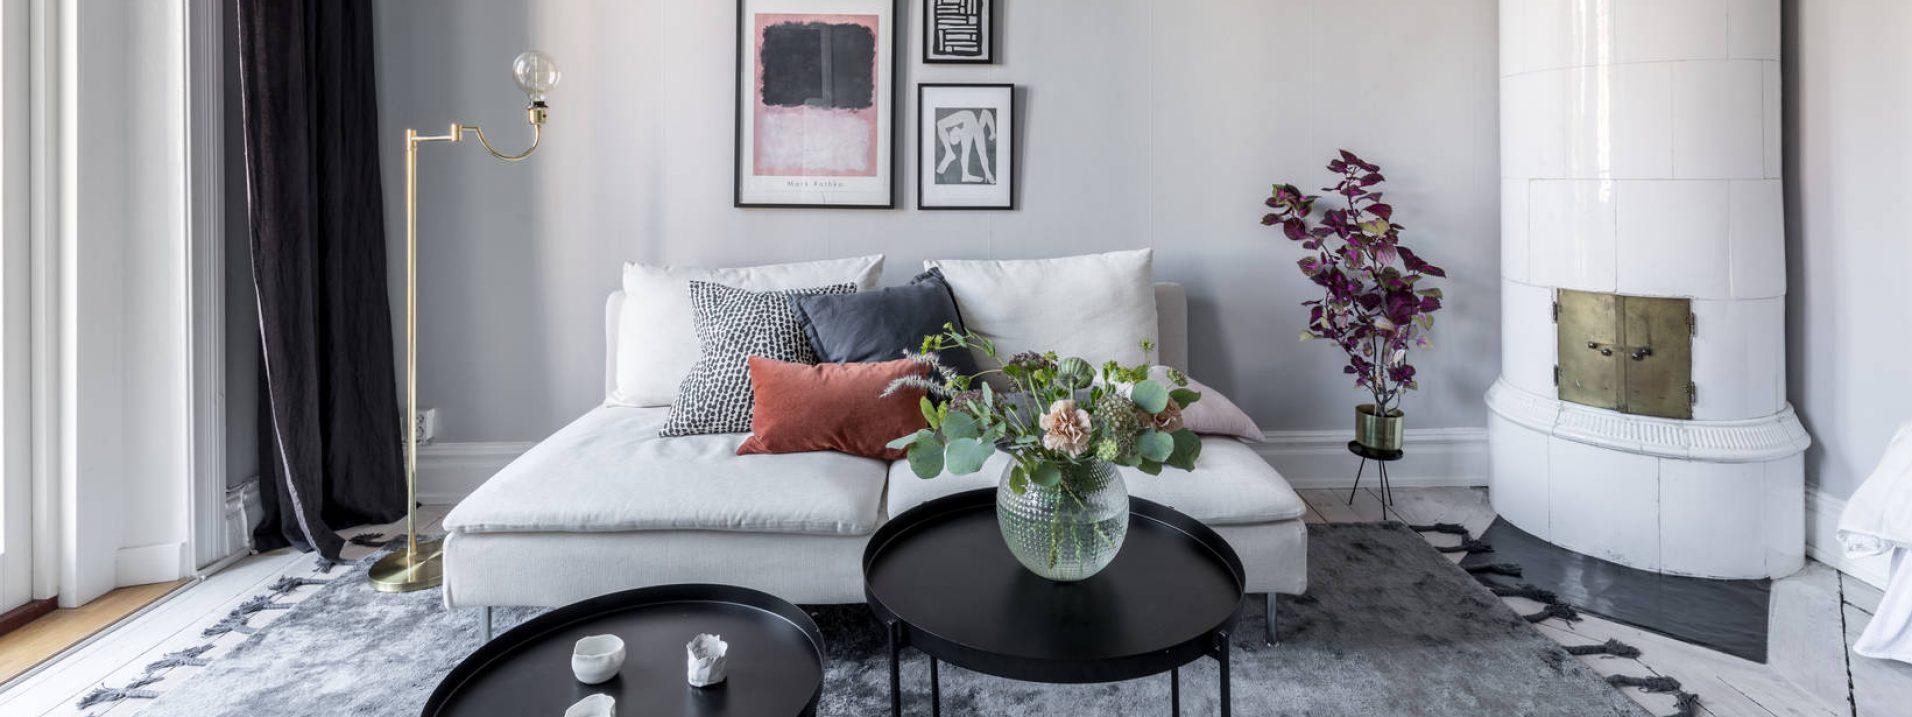 homestyling soffa kakelugn